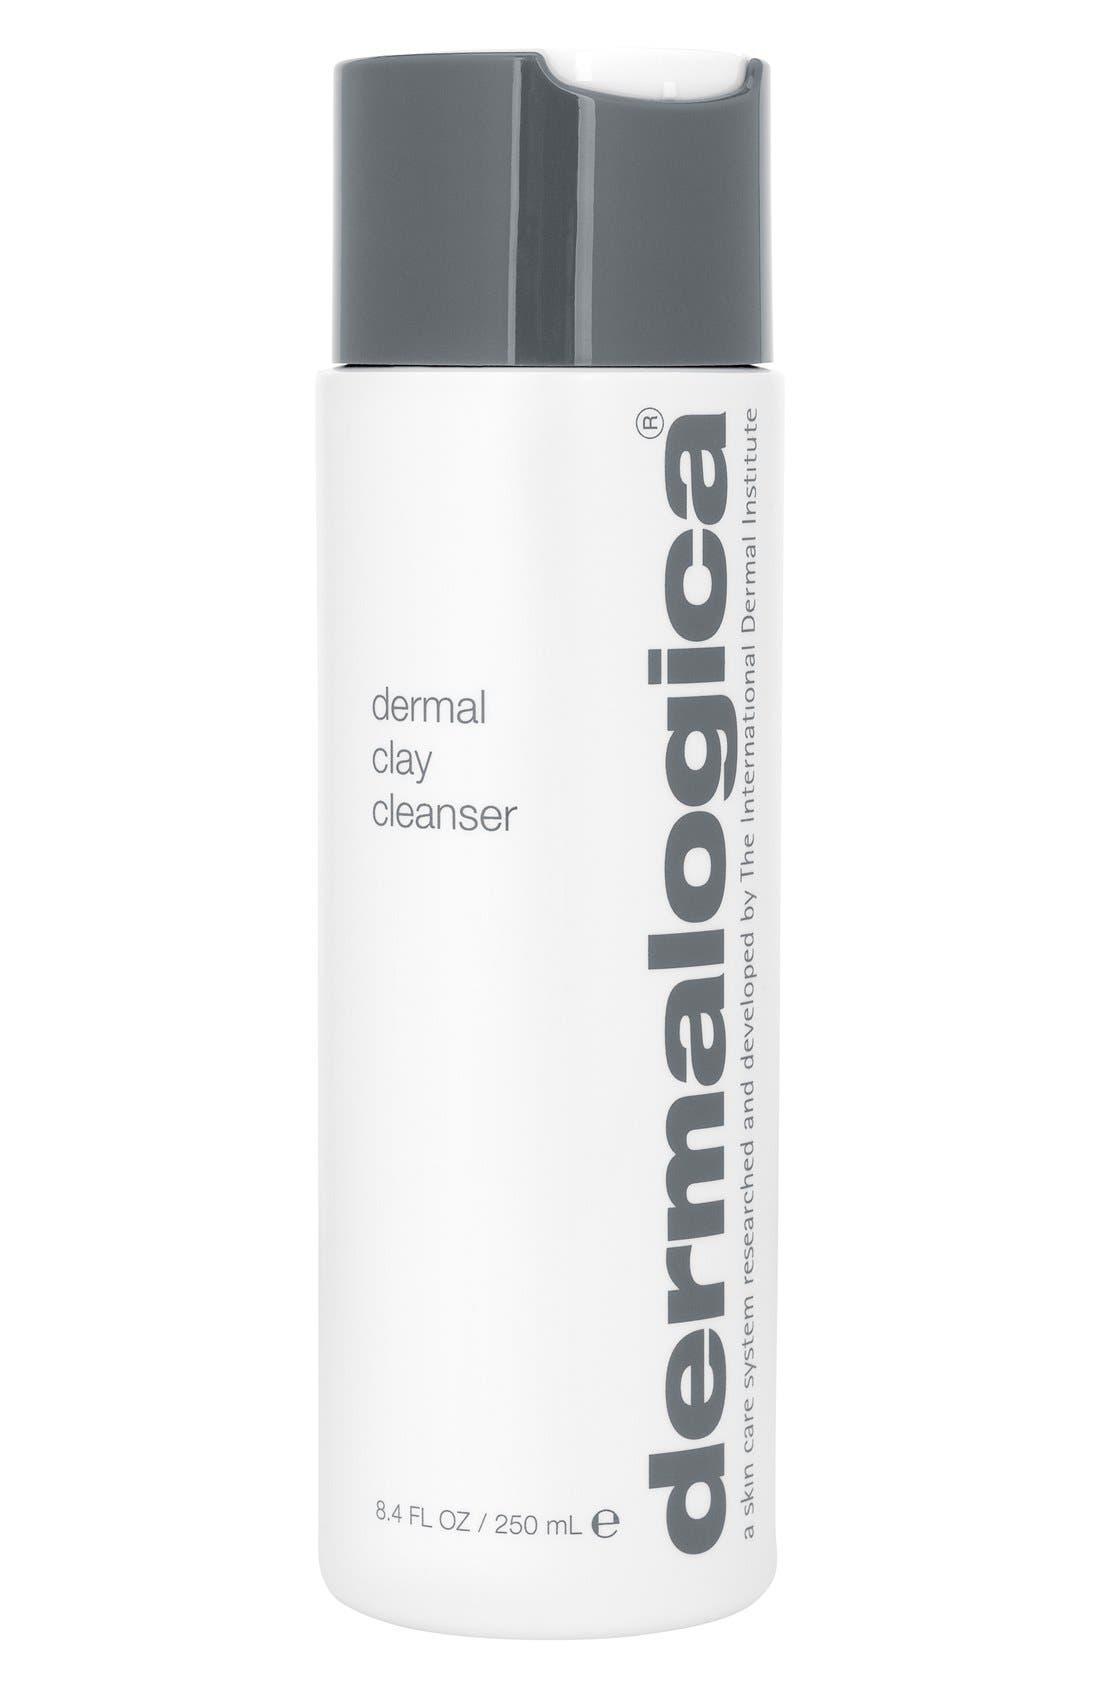 dermalogica® Dermal Clay Cleanser